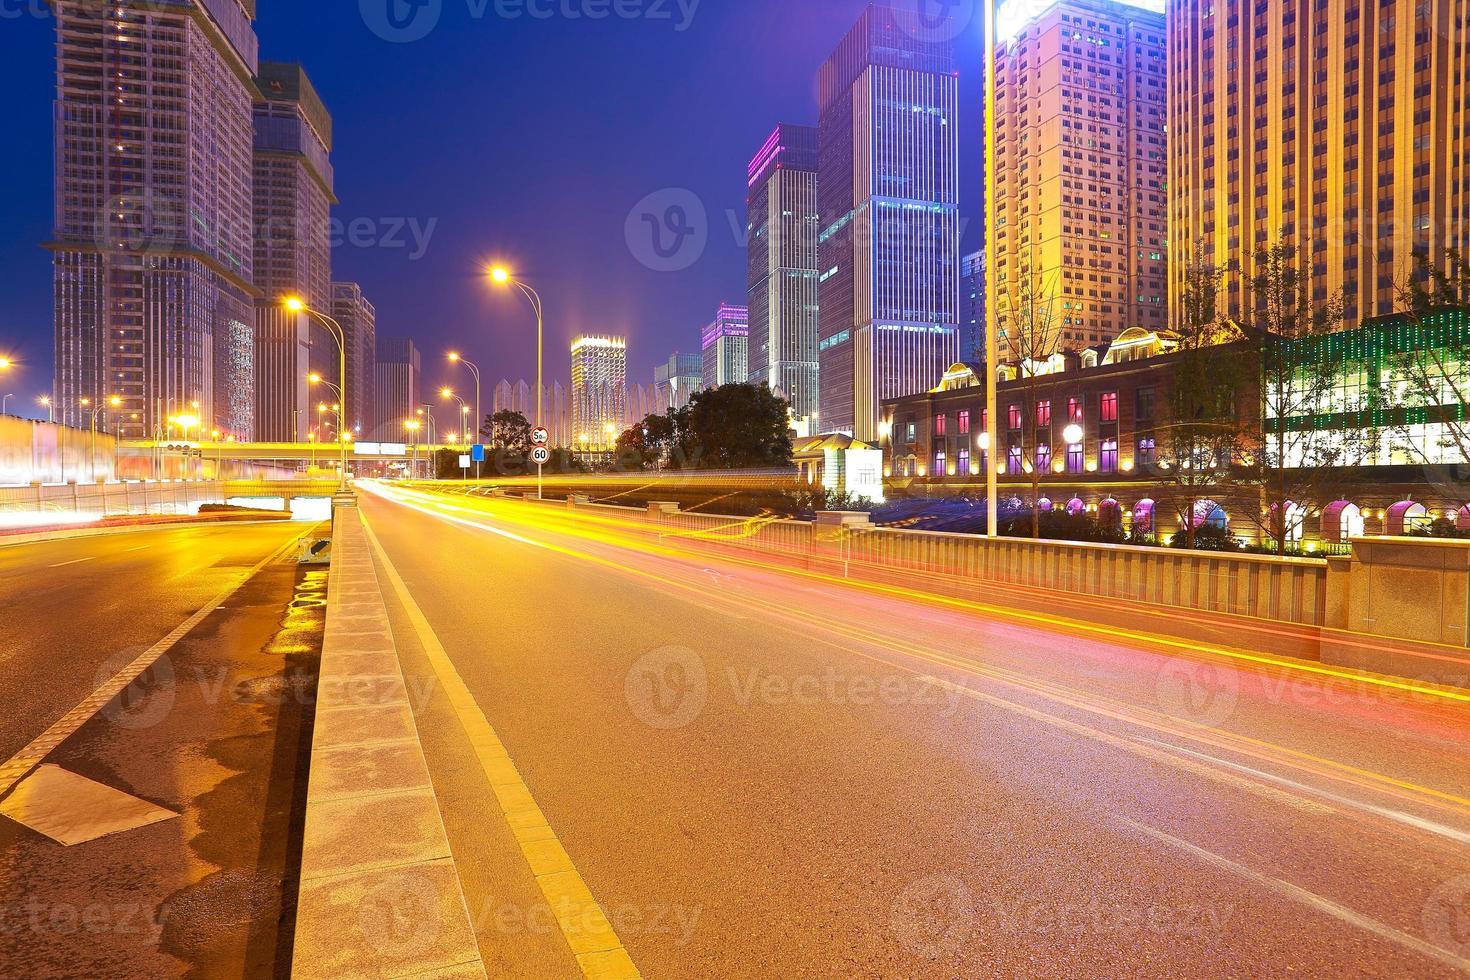 City building street scene and road of night scene photo